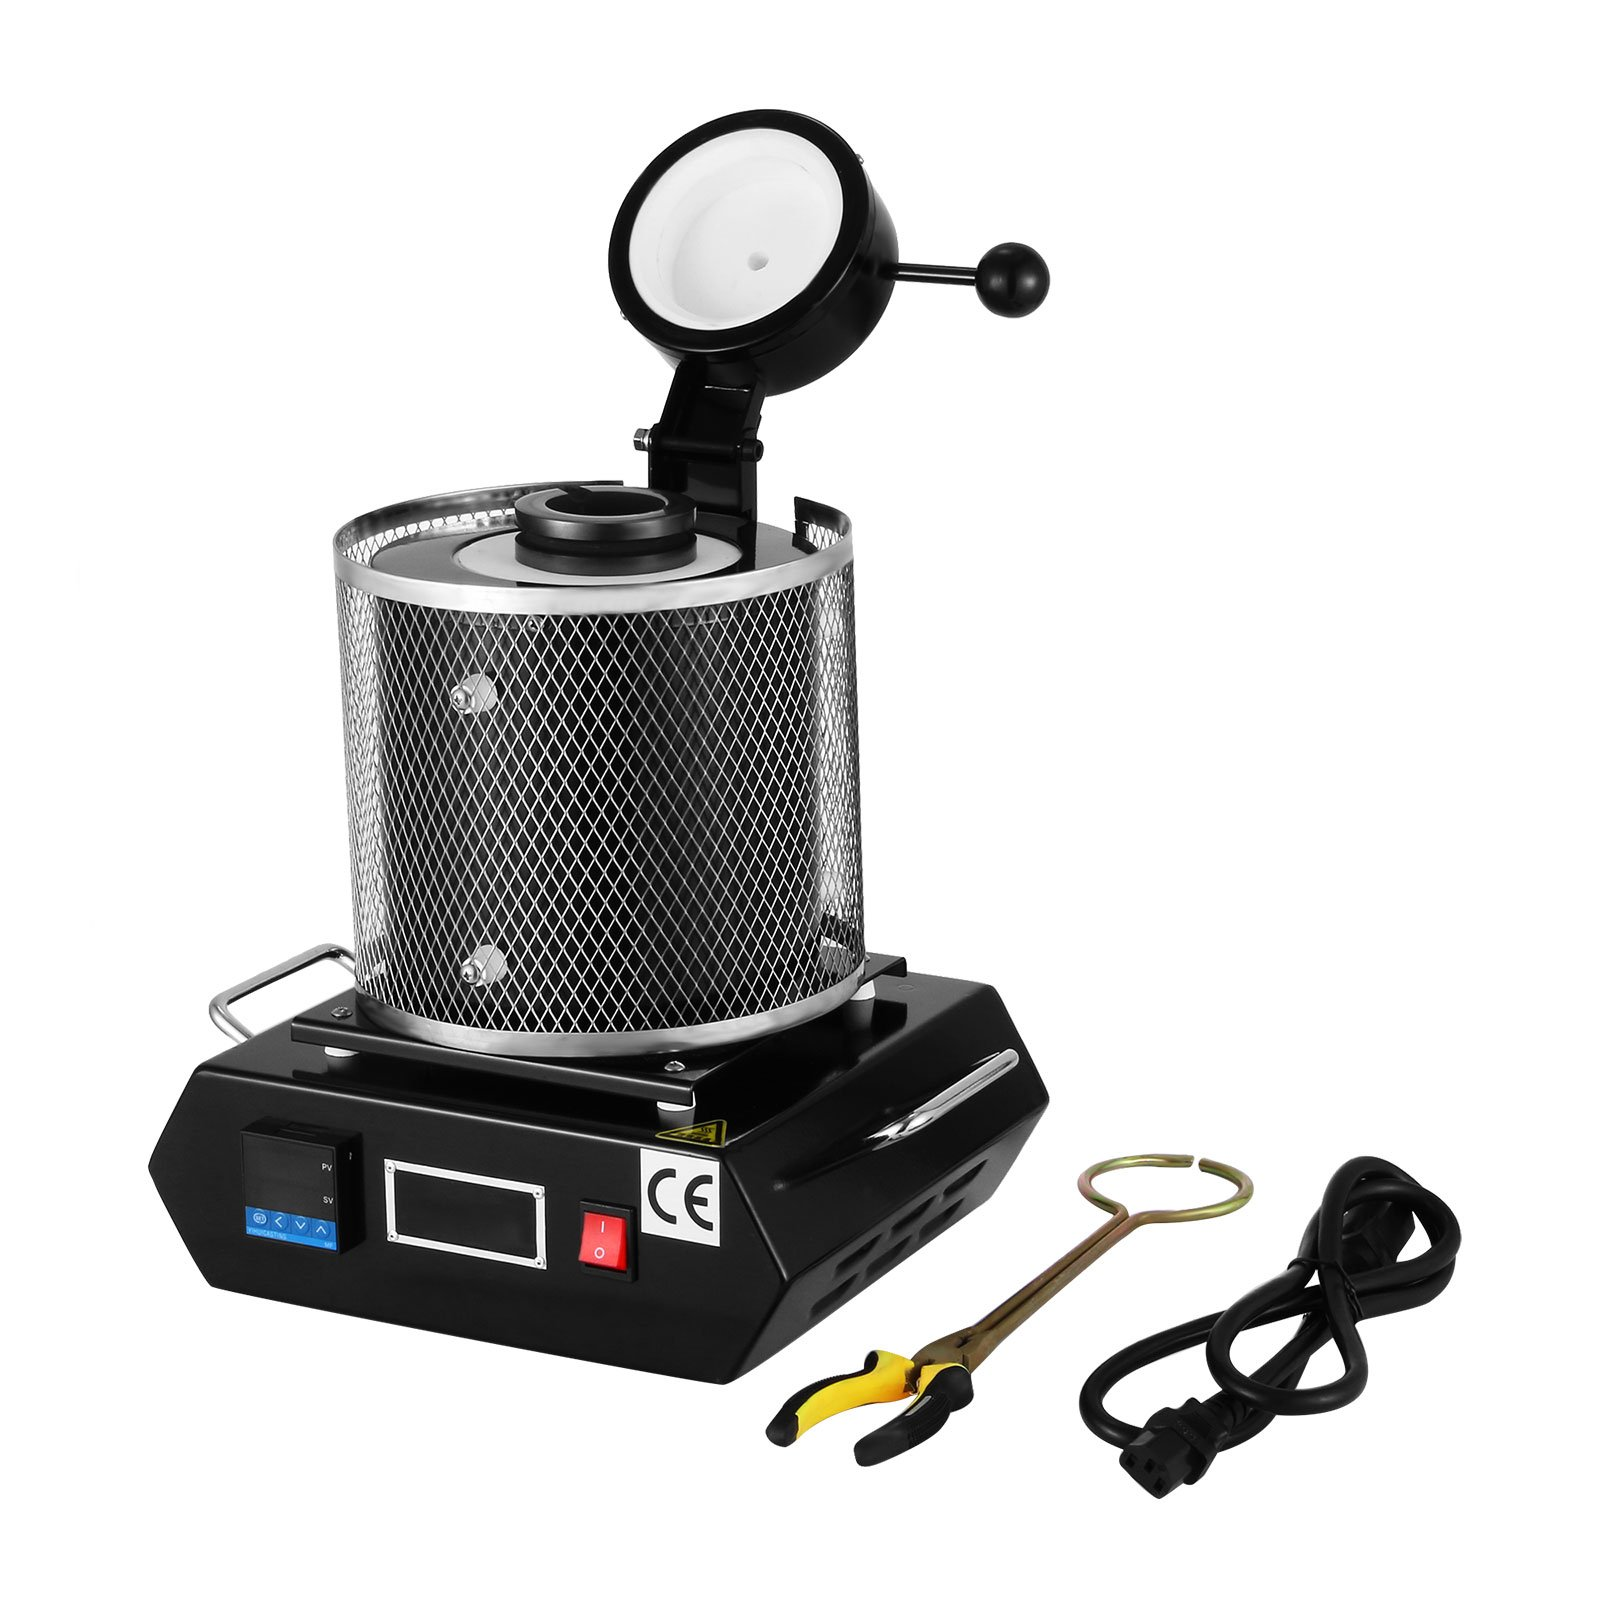 Happybuy 3KG Gold Melting Furnace 2102℉ Digital Melting Furnace Machine Heating Capacity 2100W Casting Refining for Precious Metals Gold Silver Tin Aluminum (3KG)